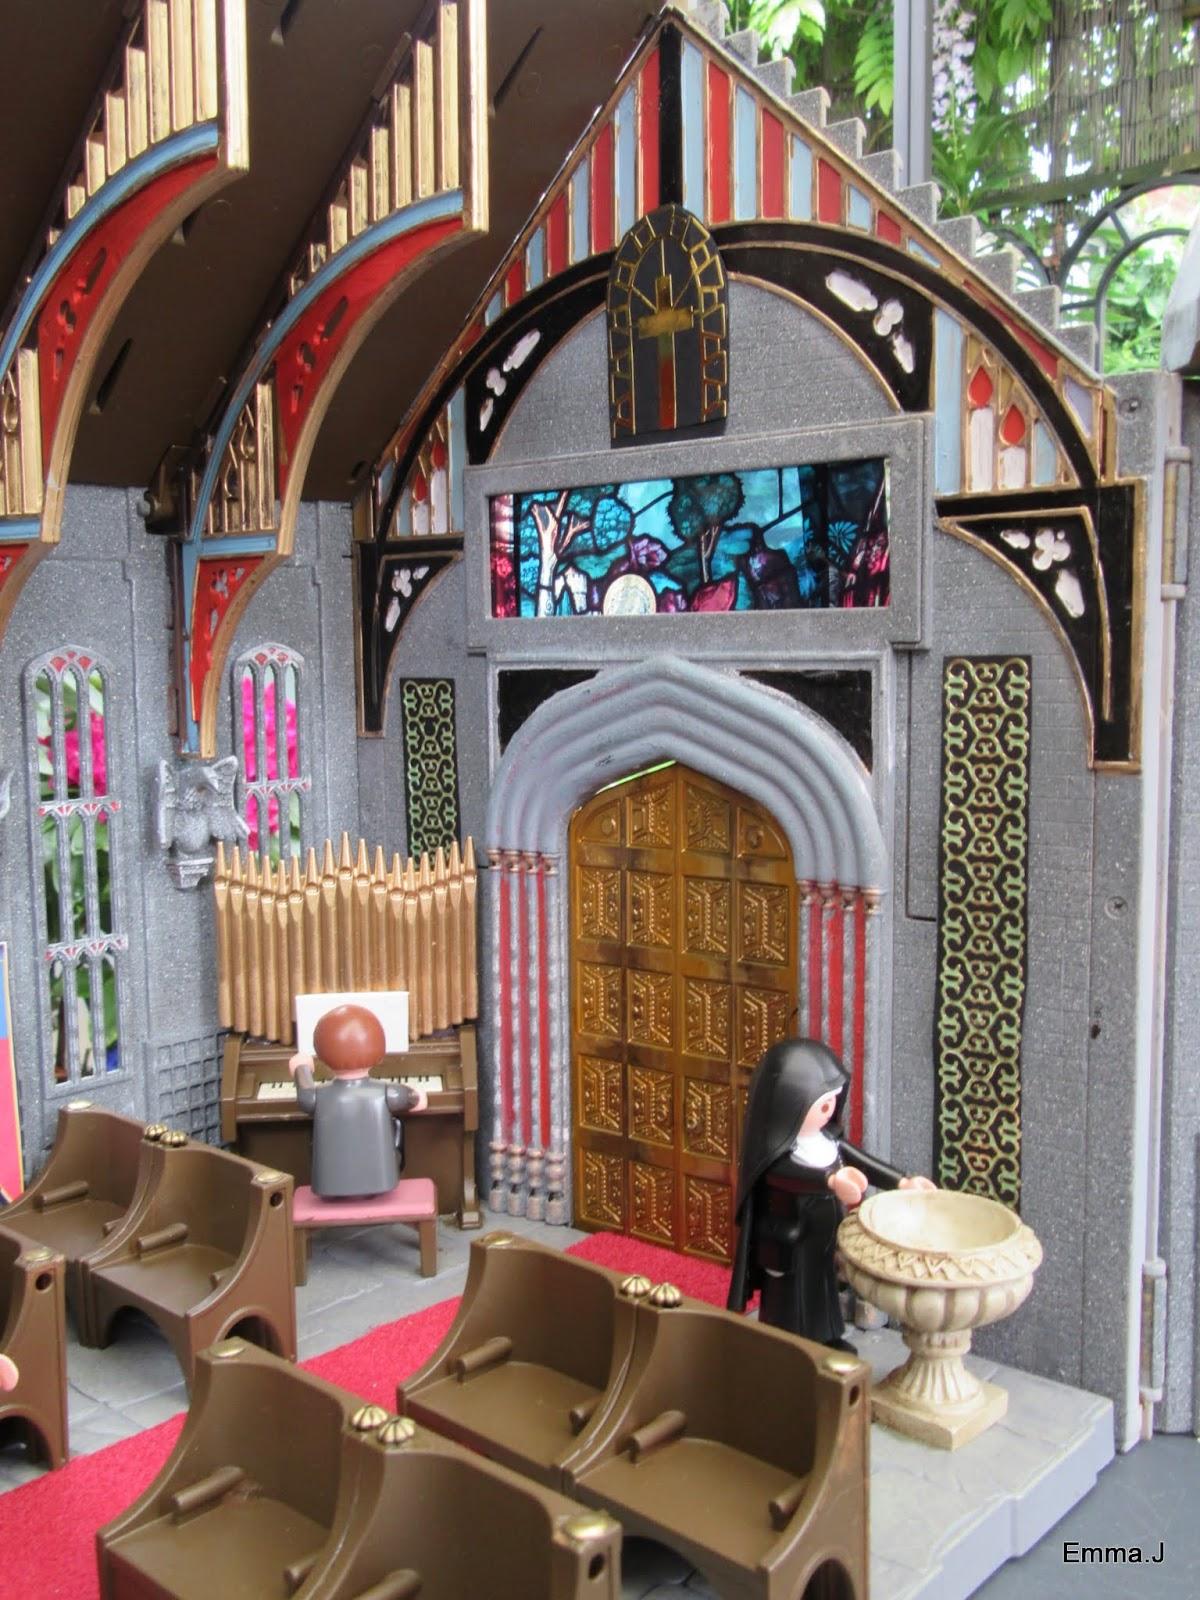 Large Church | Emma.J's Playmobil